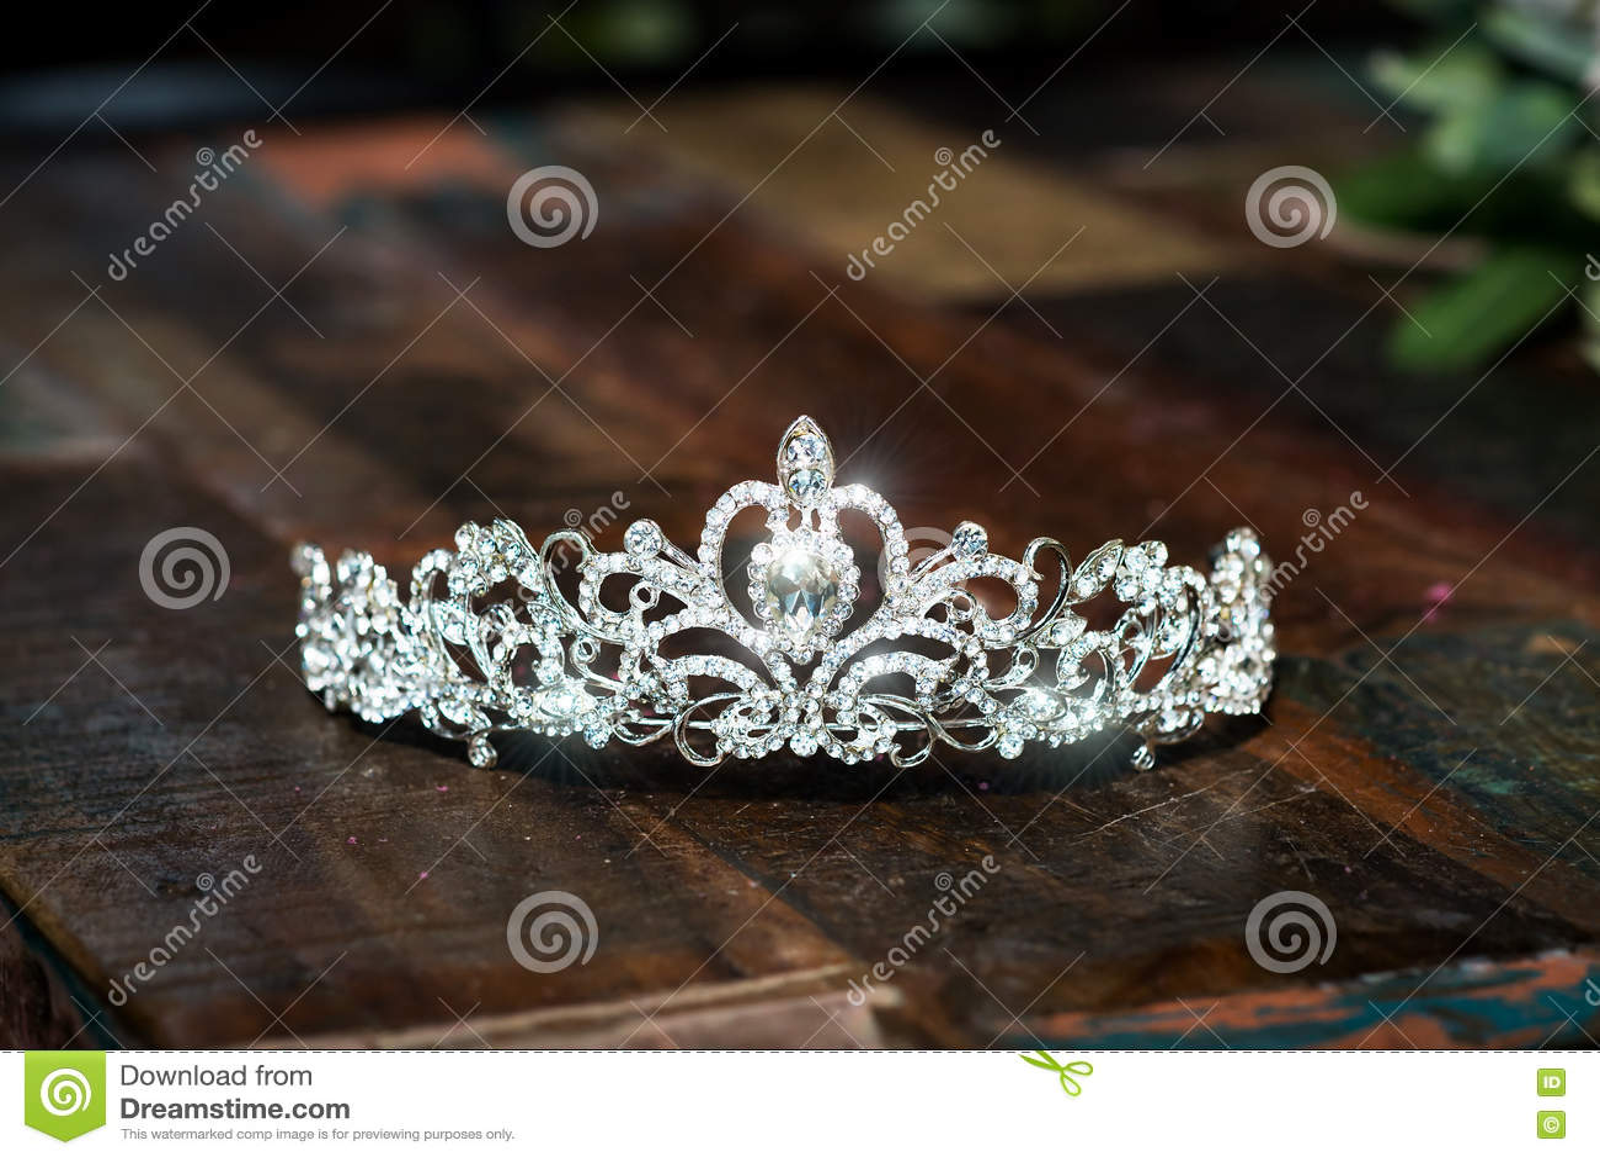 Tiara, diadem wedding crown. Luxury precious accessories